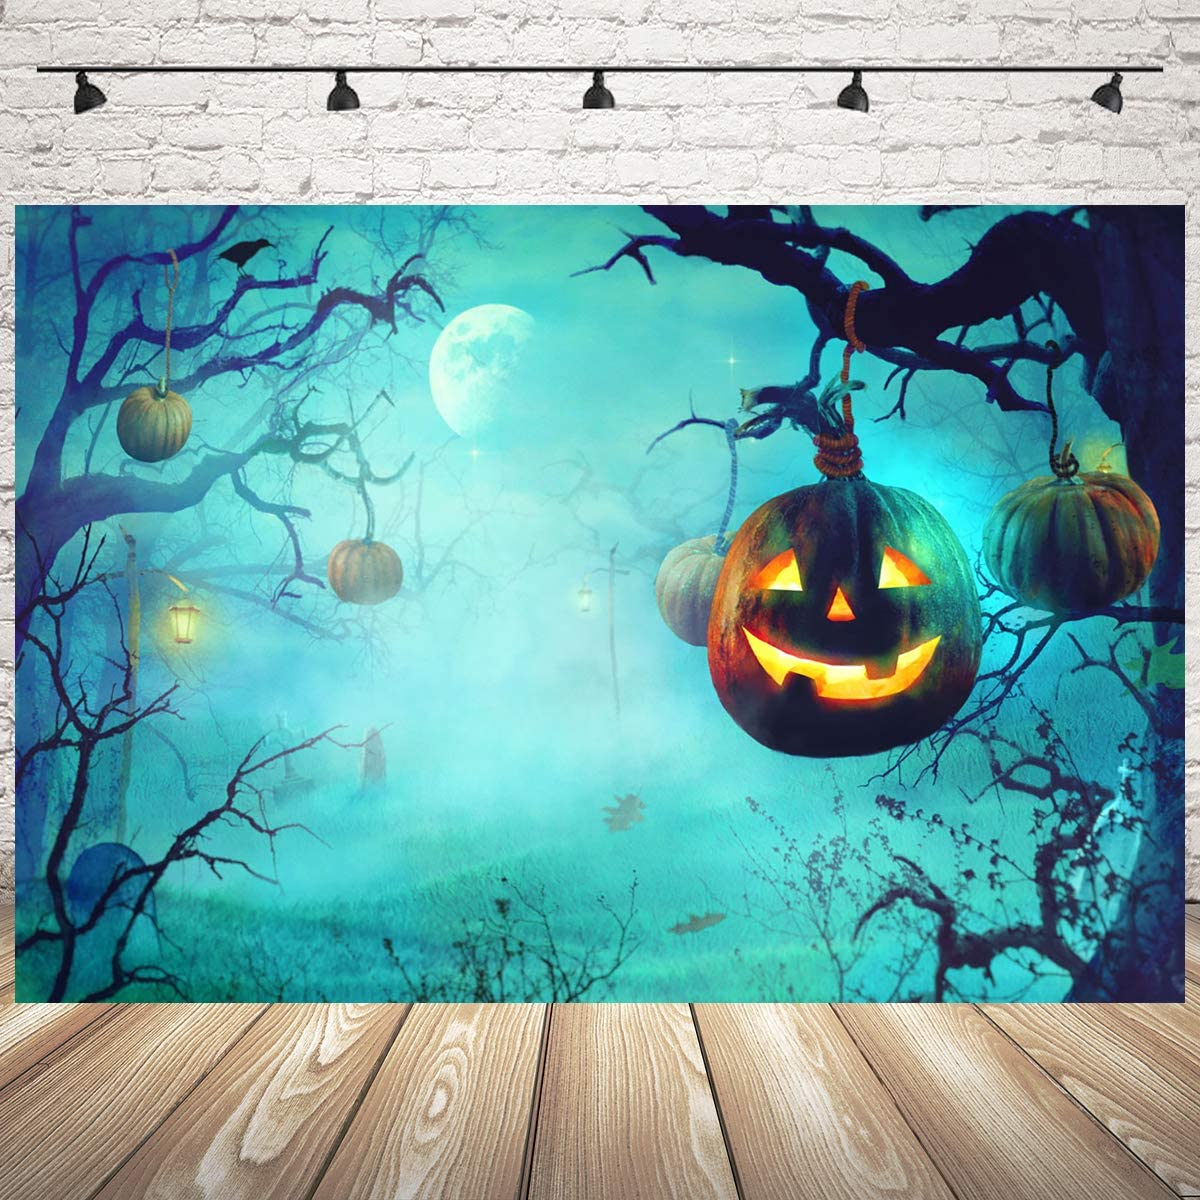 Mocsicka Halloween Backdrop 7x5ft Vinyl Halloween Night Horror Pumpkin Lantern Photo Backdrops All Saints Day Photo Studio Prop